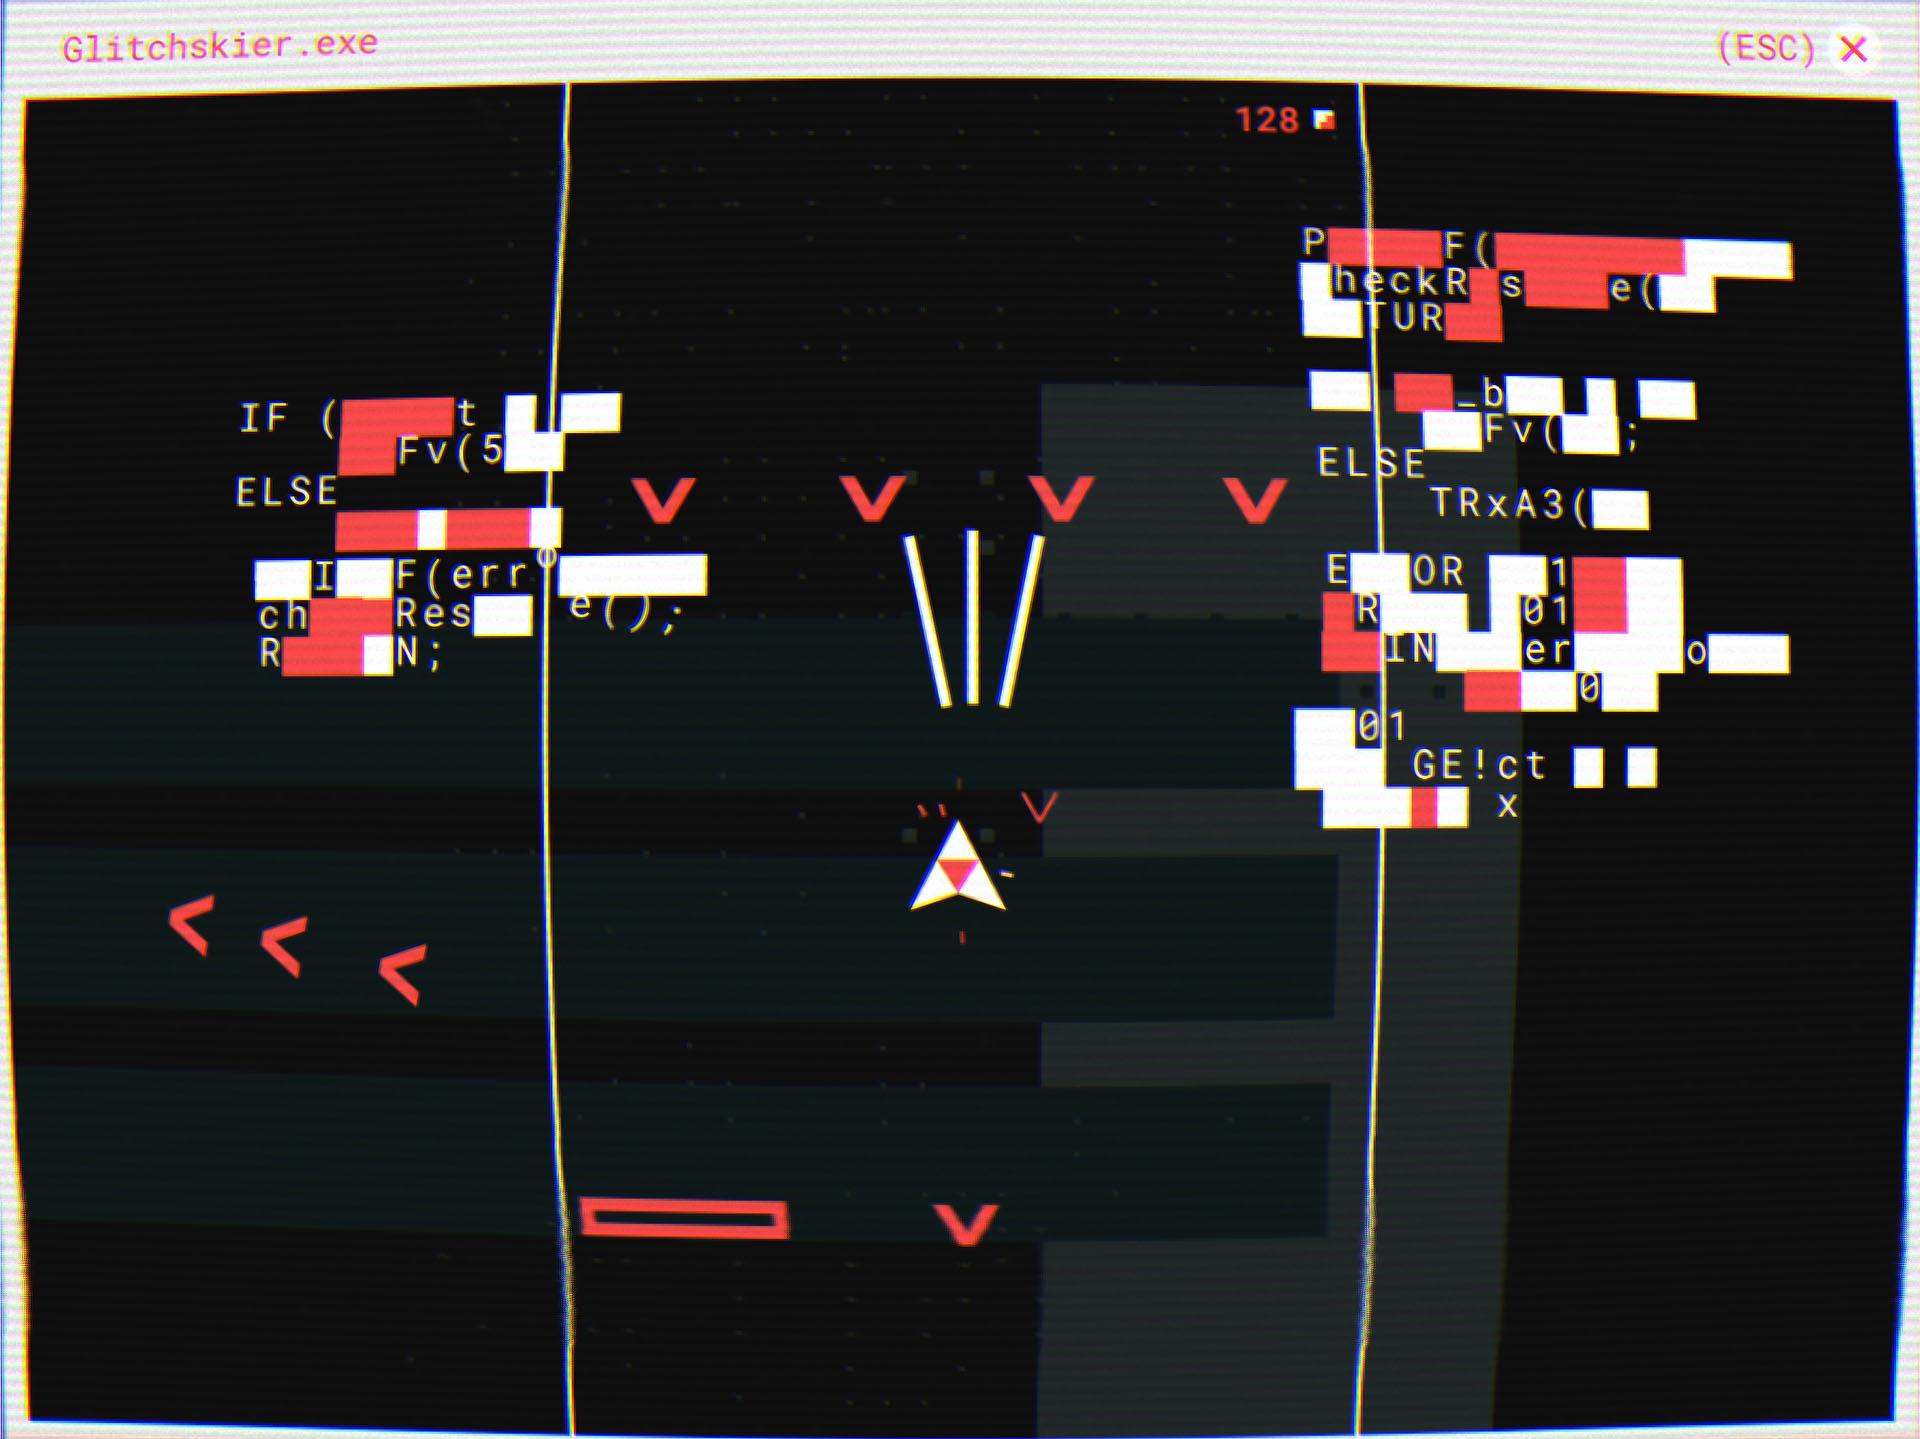 shelly-alon-game-design-Glitchskier